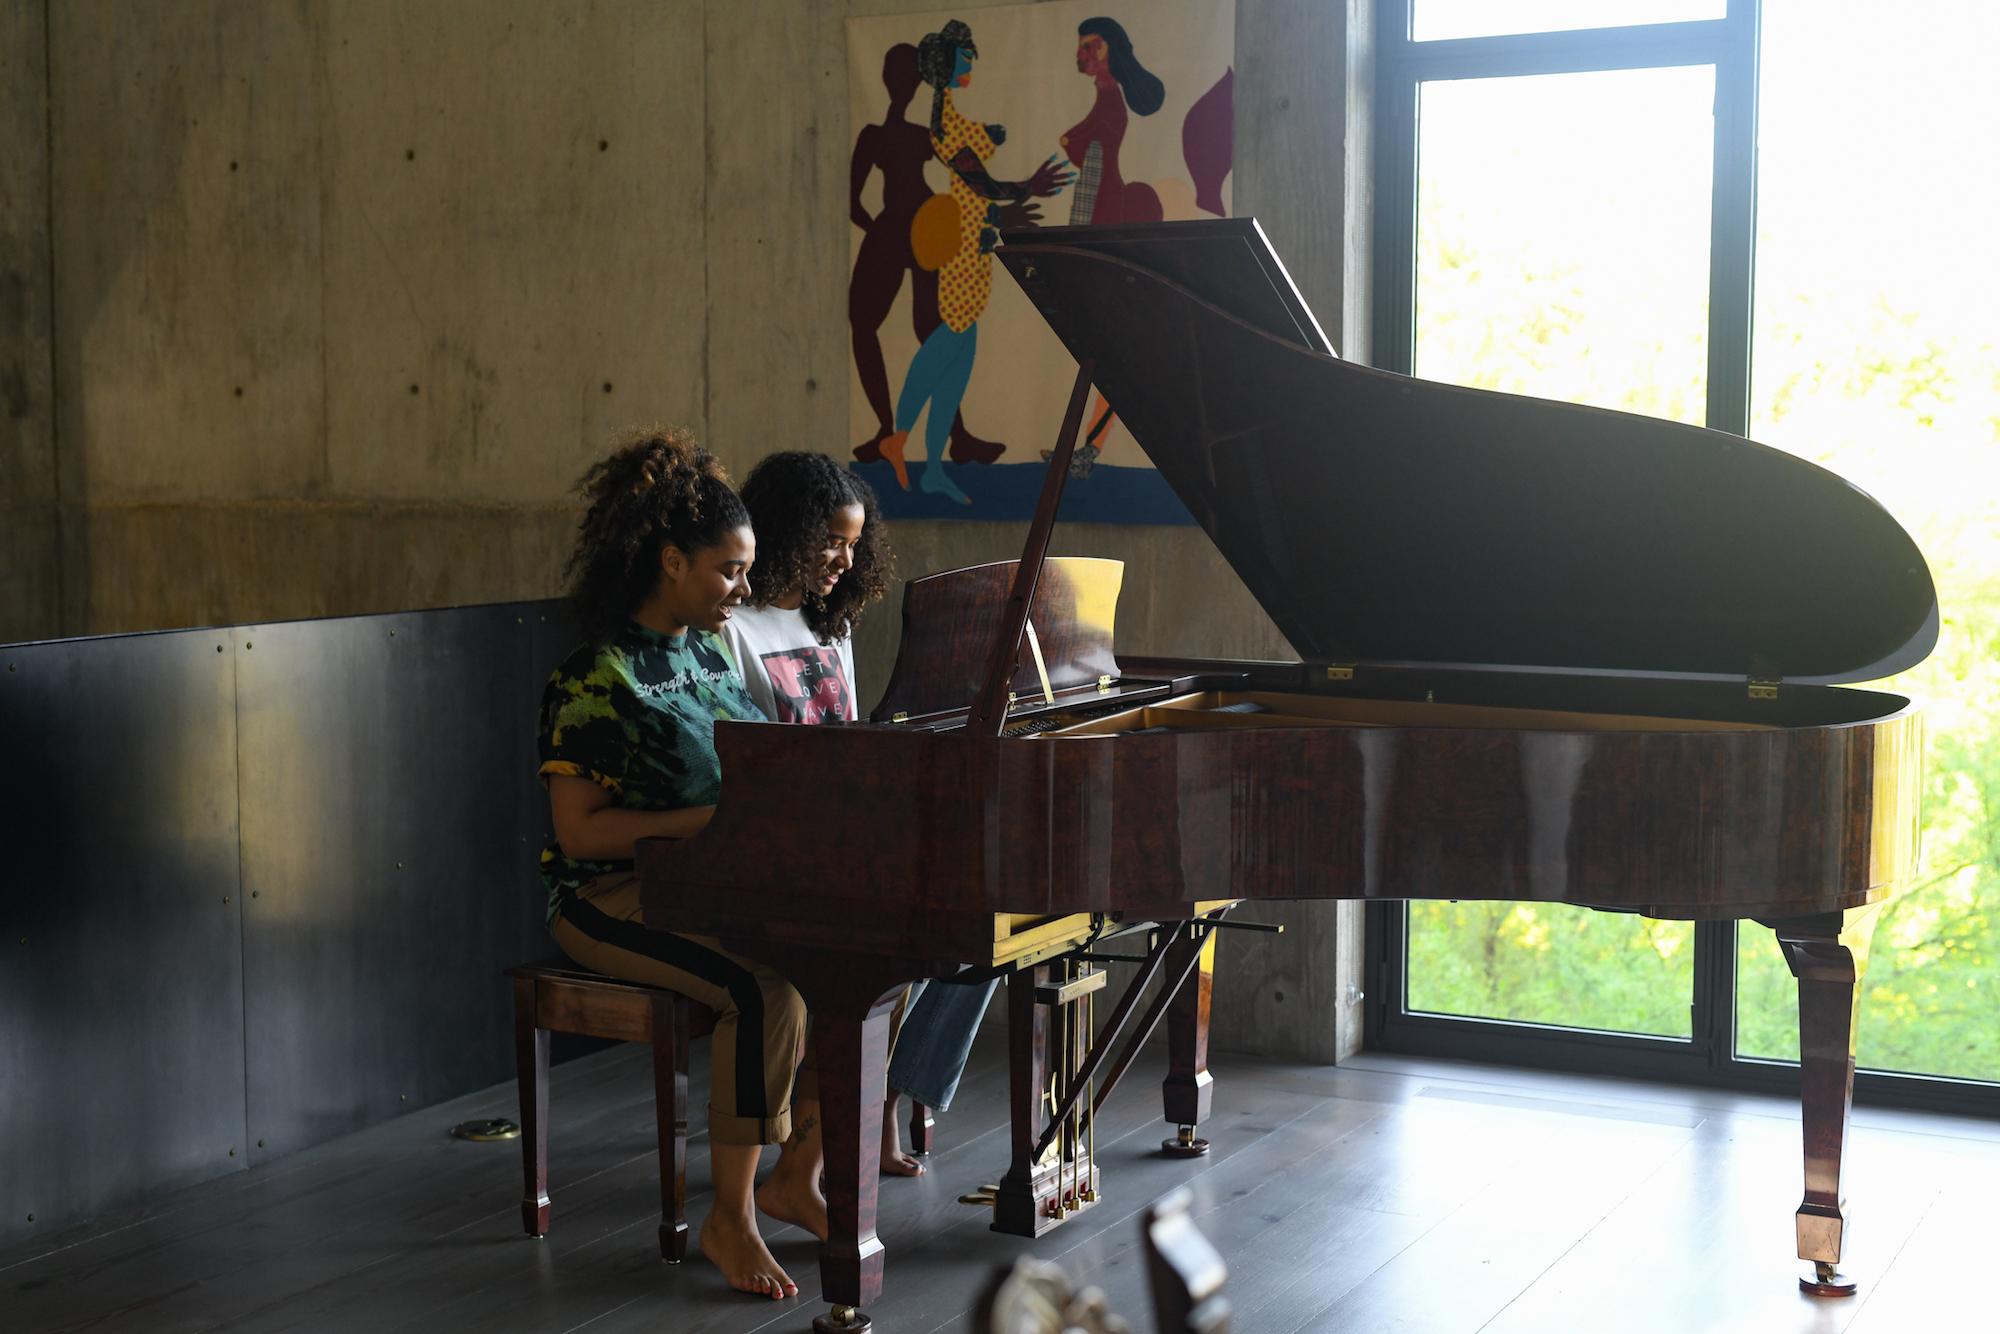 Two girls playing piano